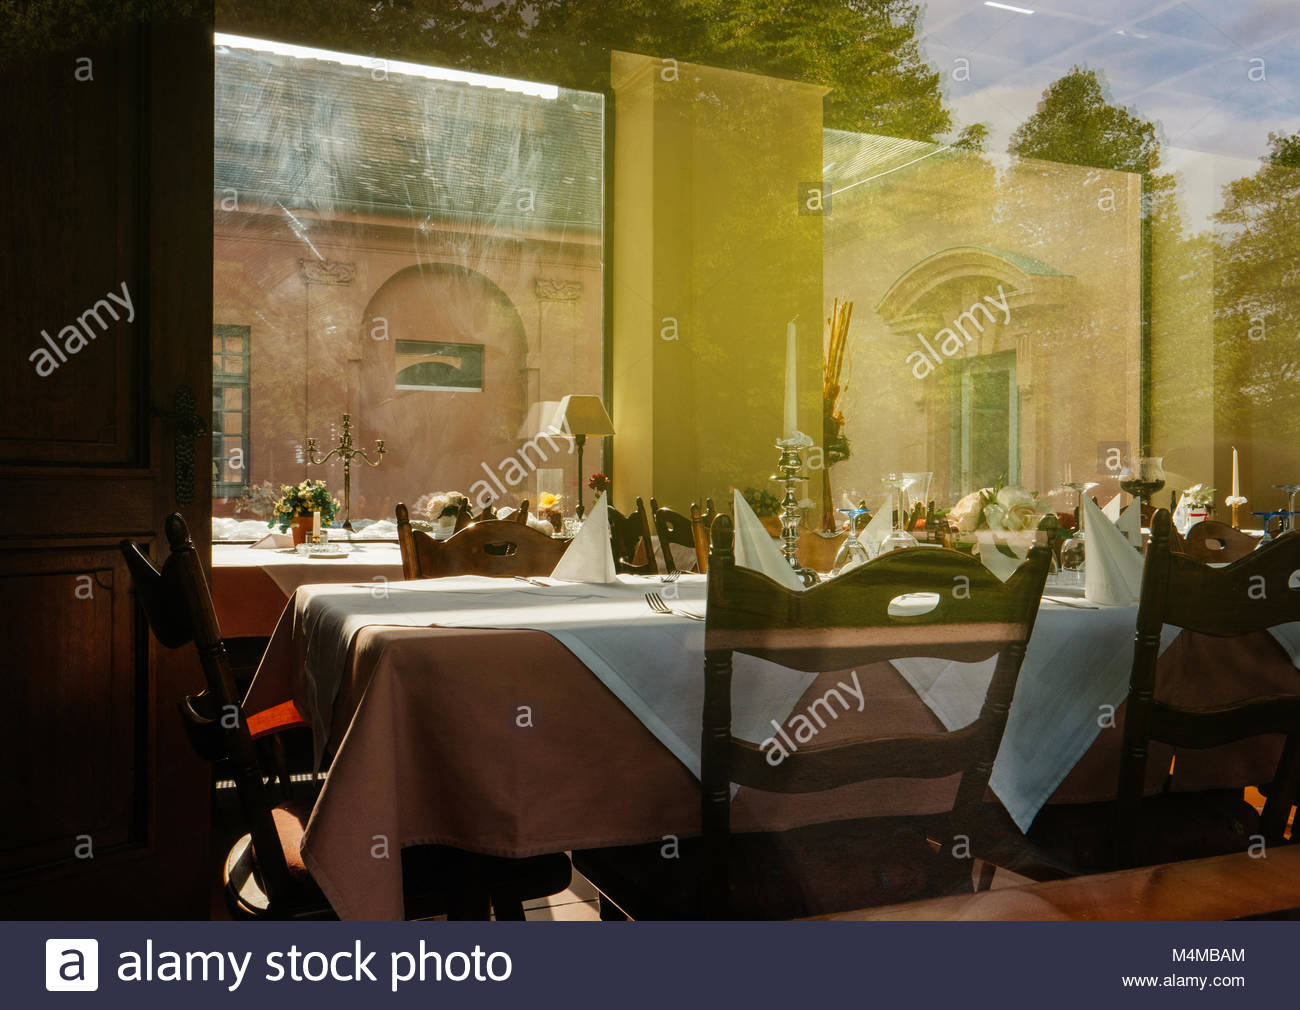 Leeren Tisch im Restaurant für gehobene Küche Stockbild